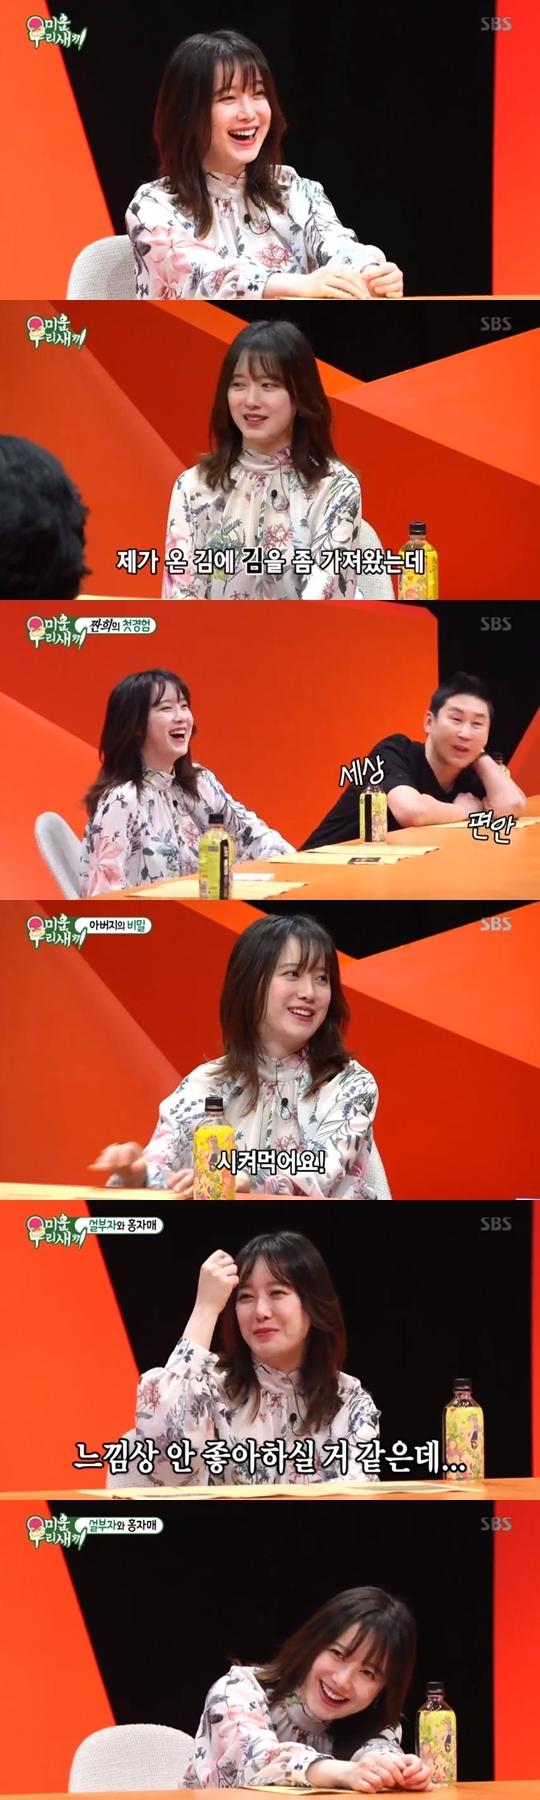 [RE:TV] 재편집한 '미우새' 구혜선, 안재현 언급 없이 미소만